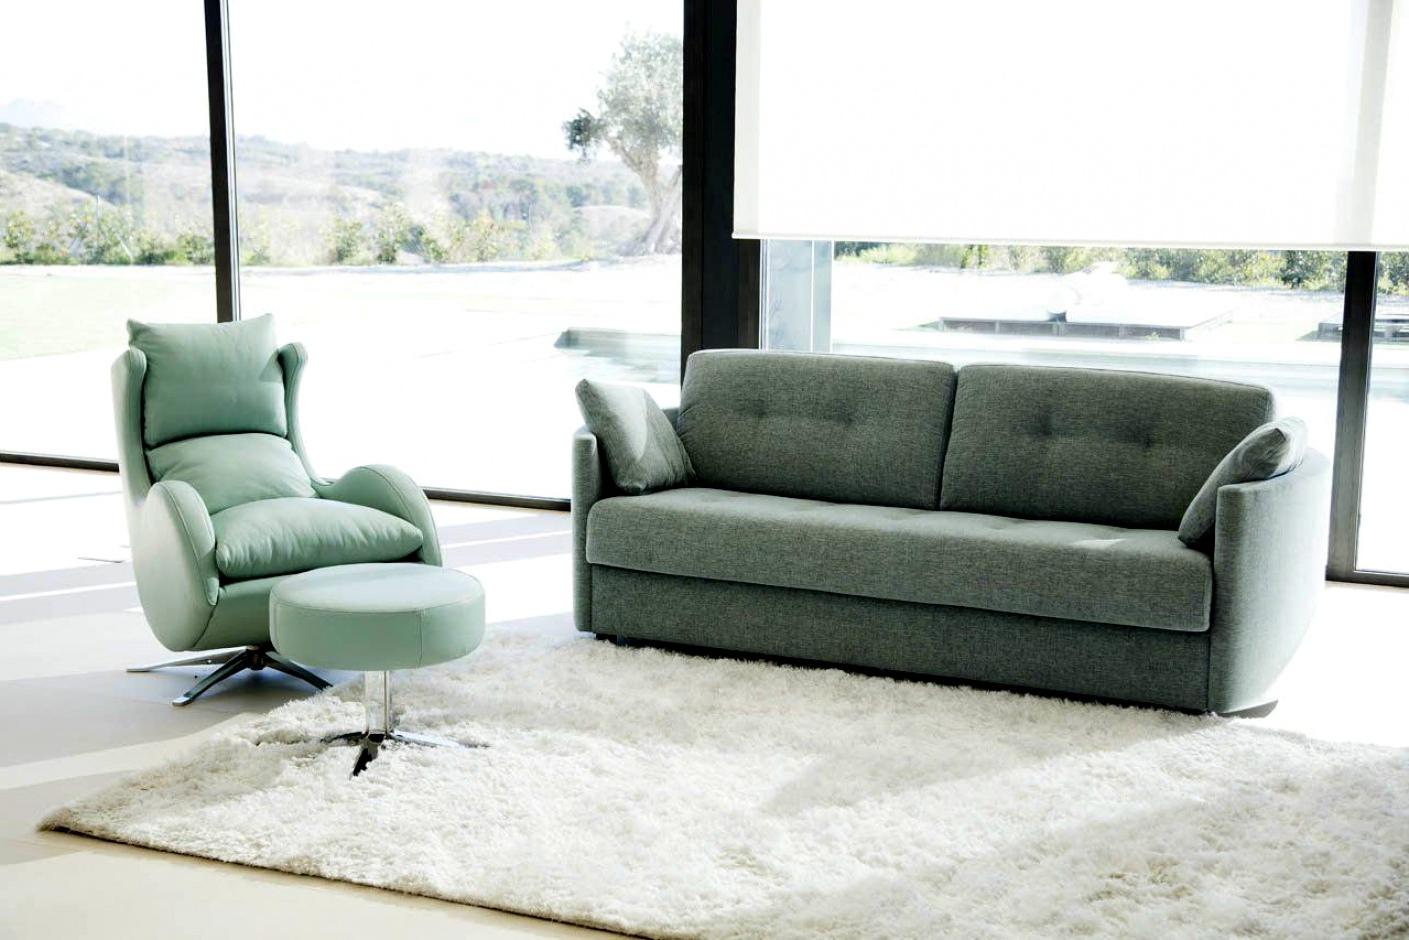 Sofas Salamanca Tqd3 Im Genes sofas Salamanca sofa Living Room Pinterest and eventleo